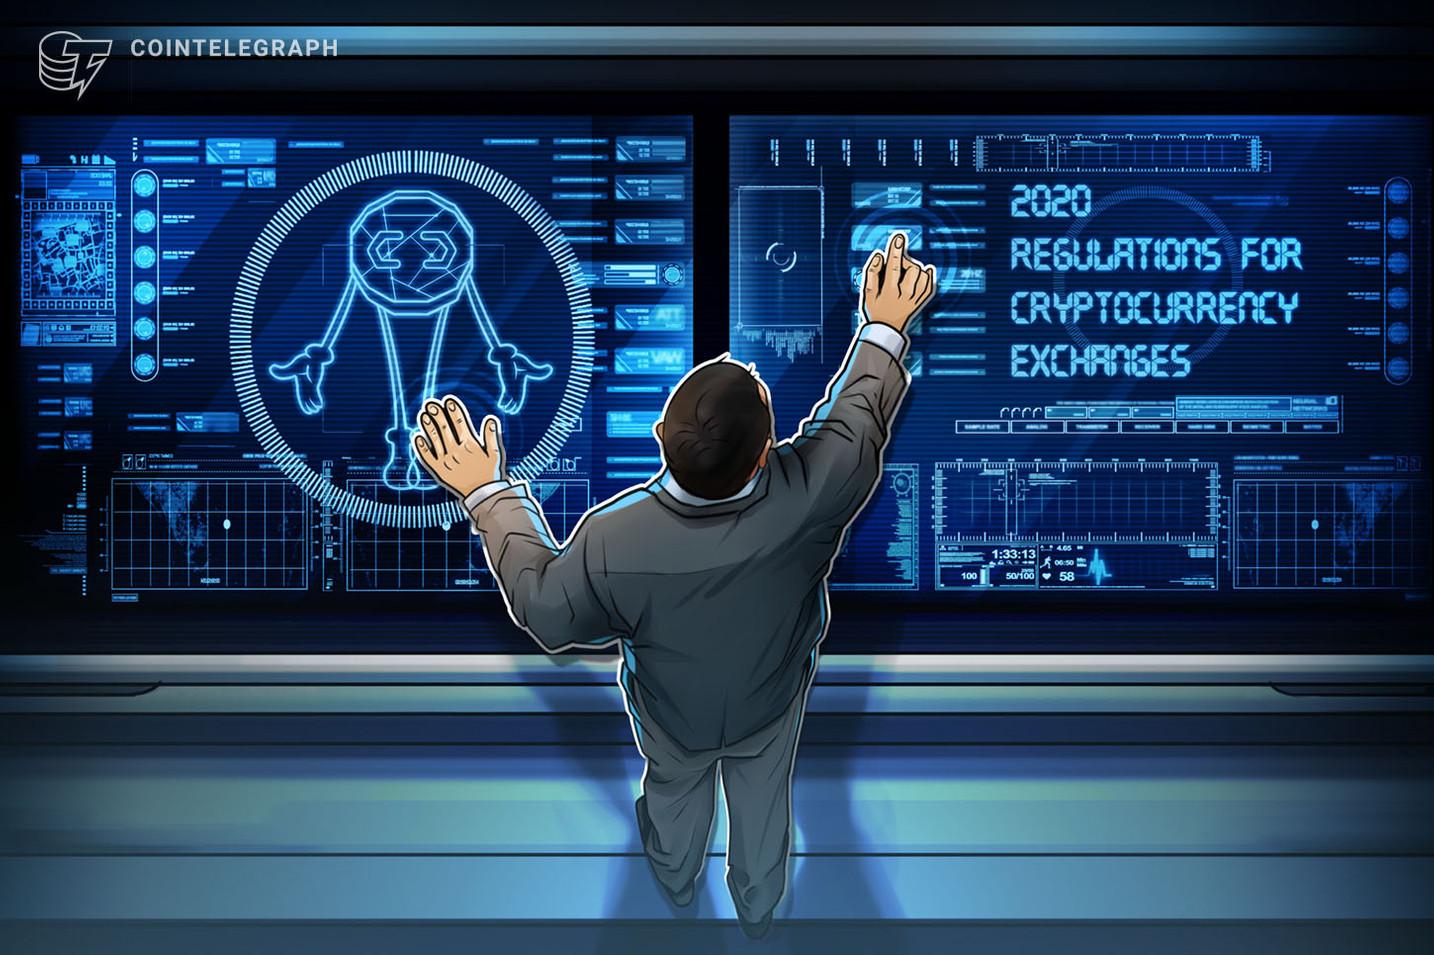 International Regulatory Milestones for Crypto Exchanges in 2020